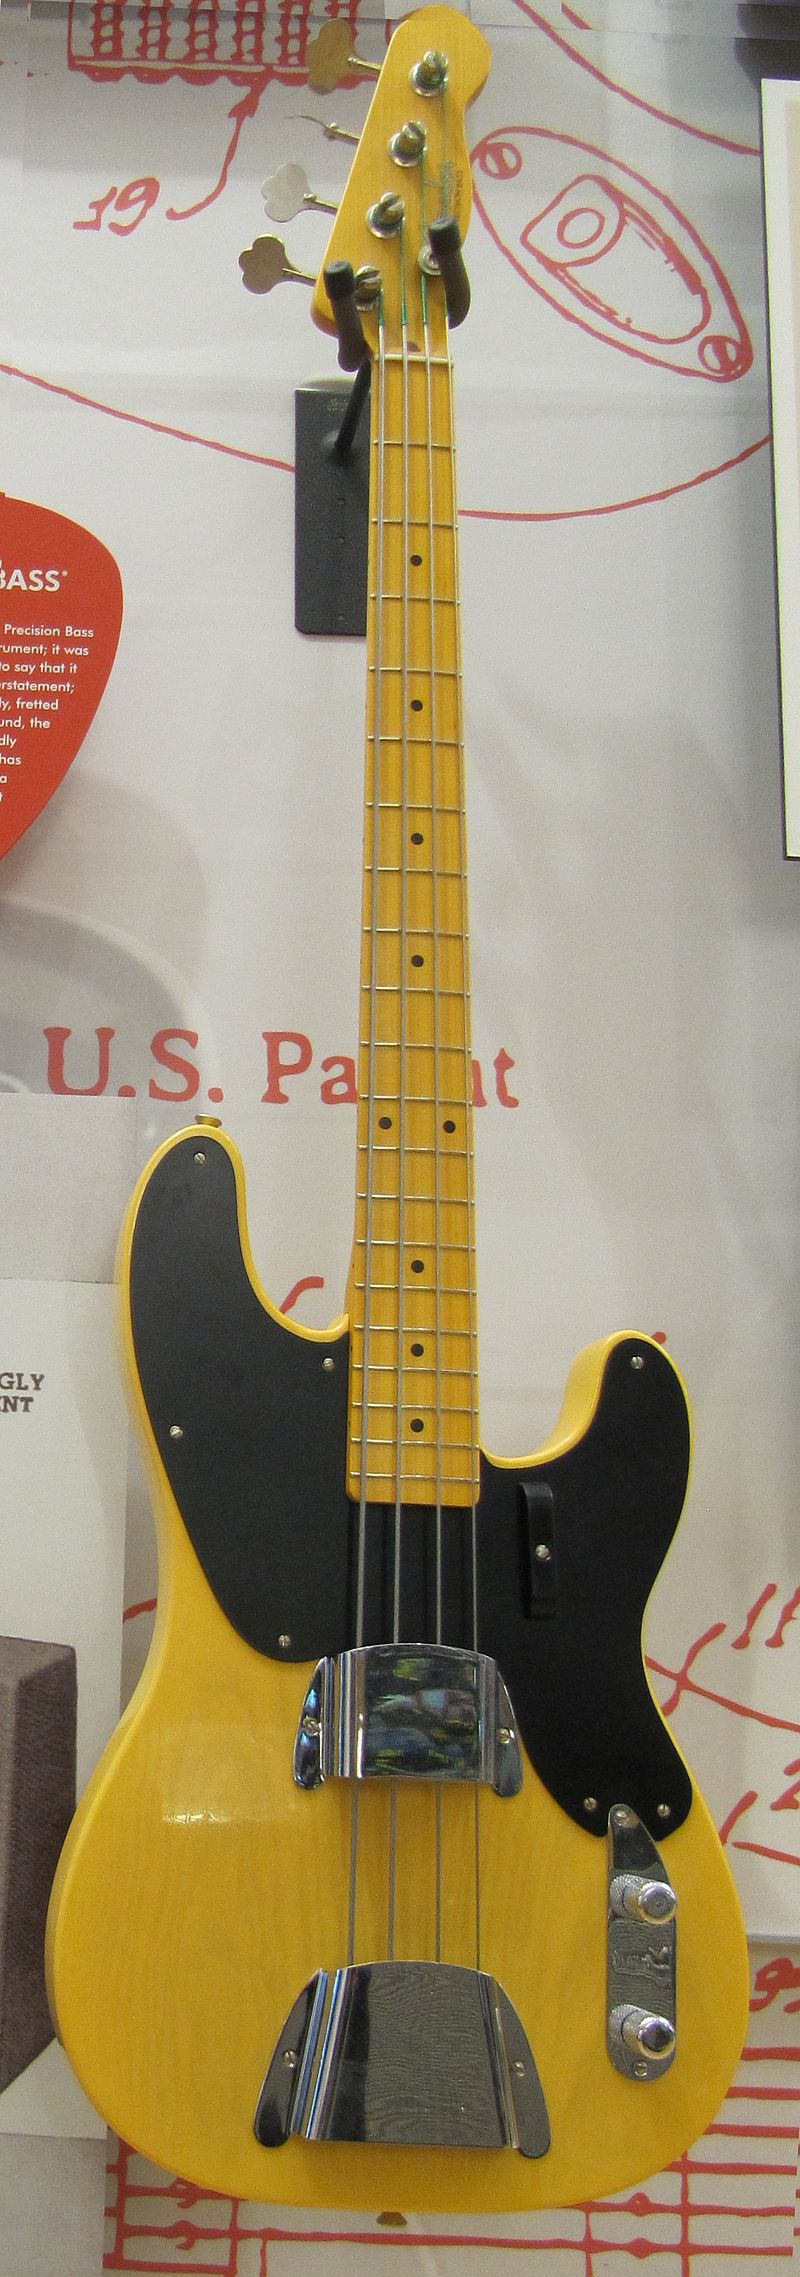 Fender %2751 Precision Bass, FGF museum.jpg